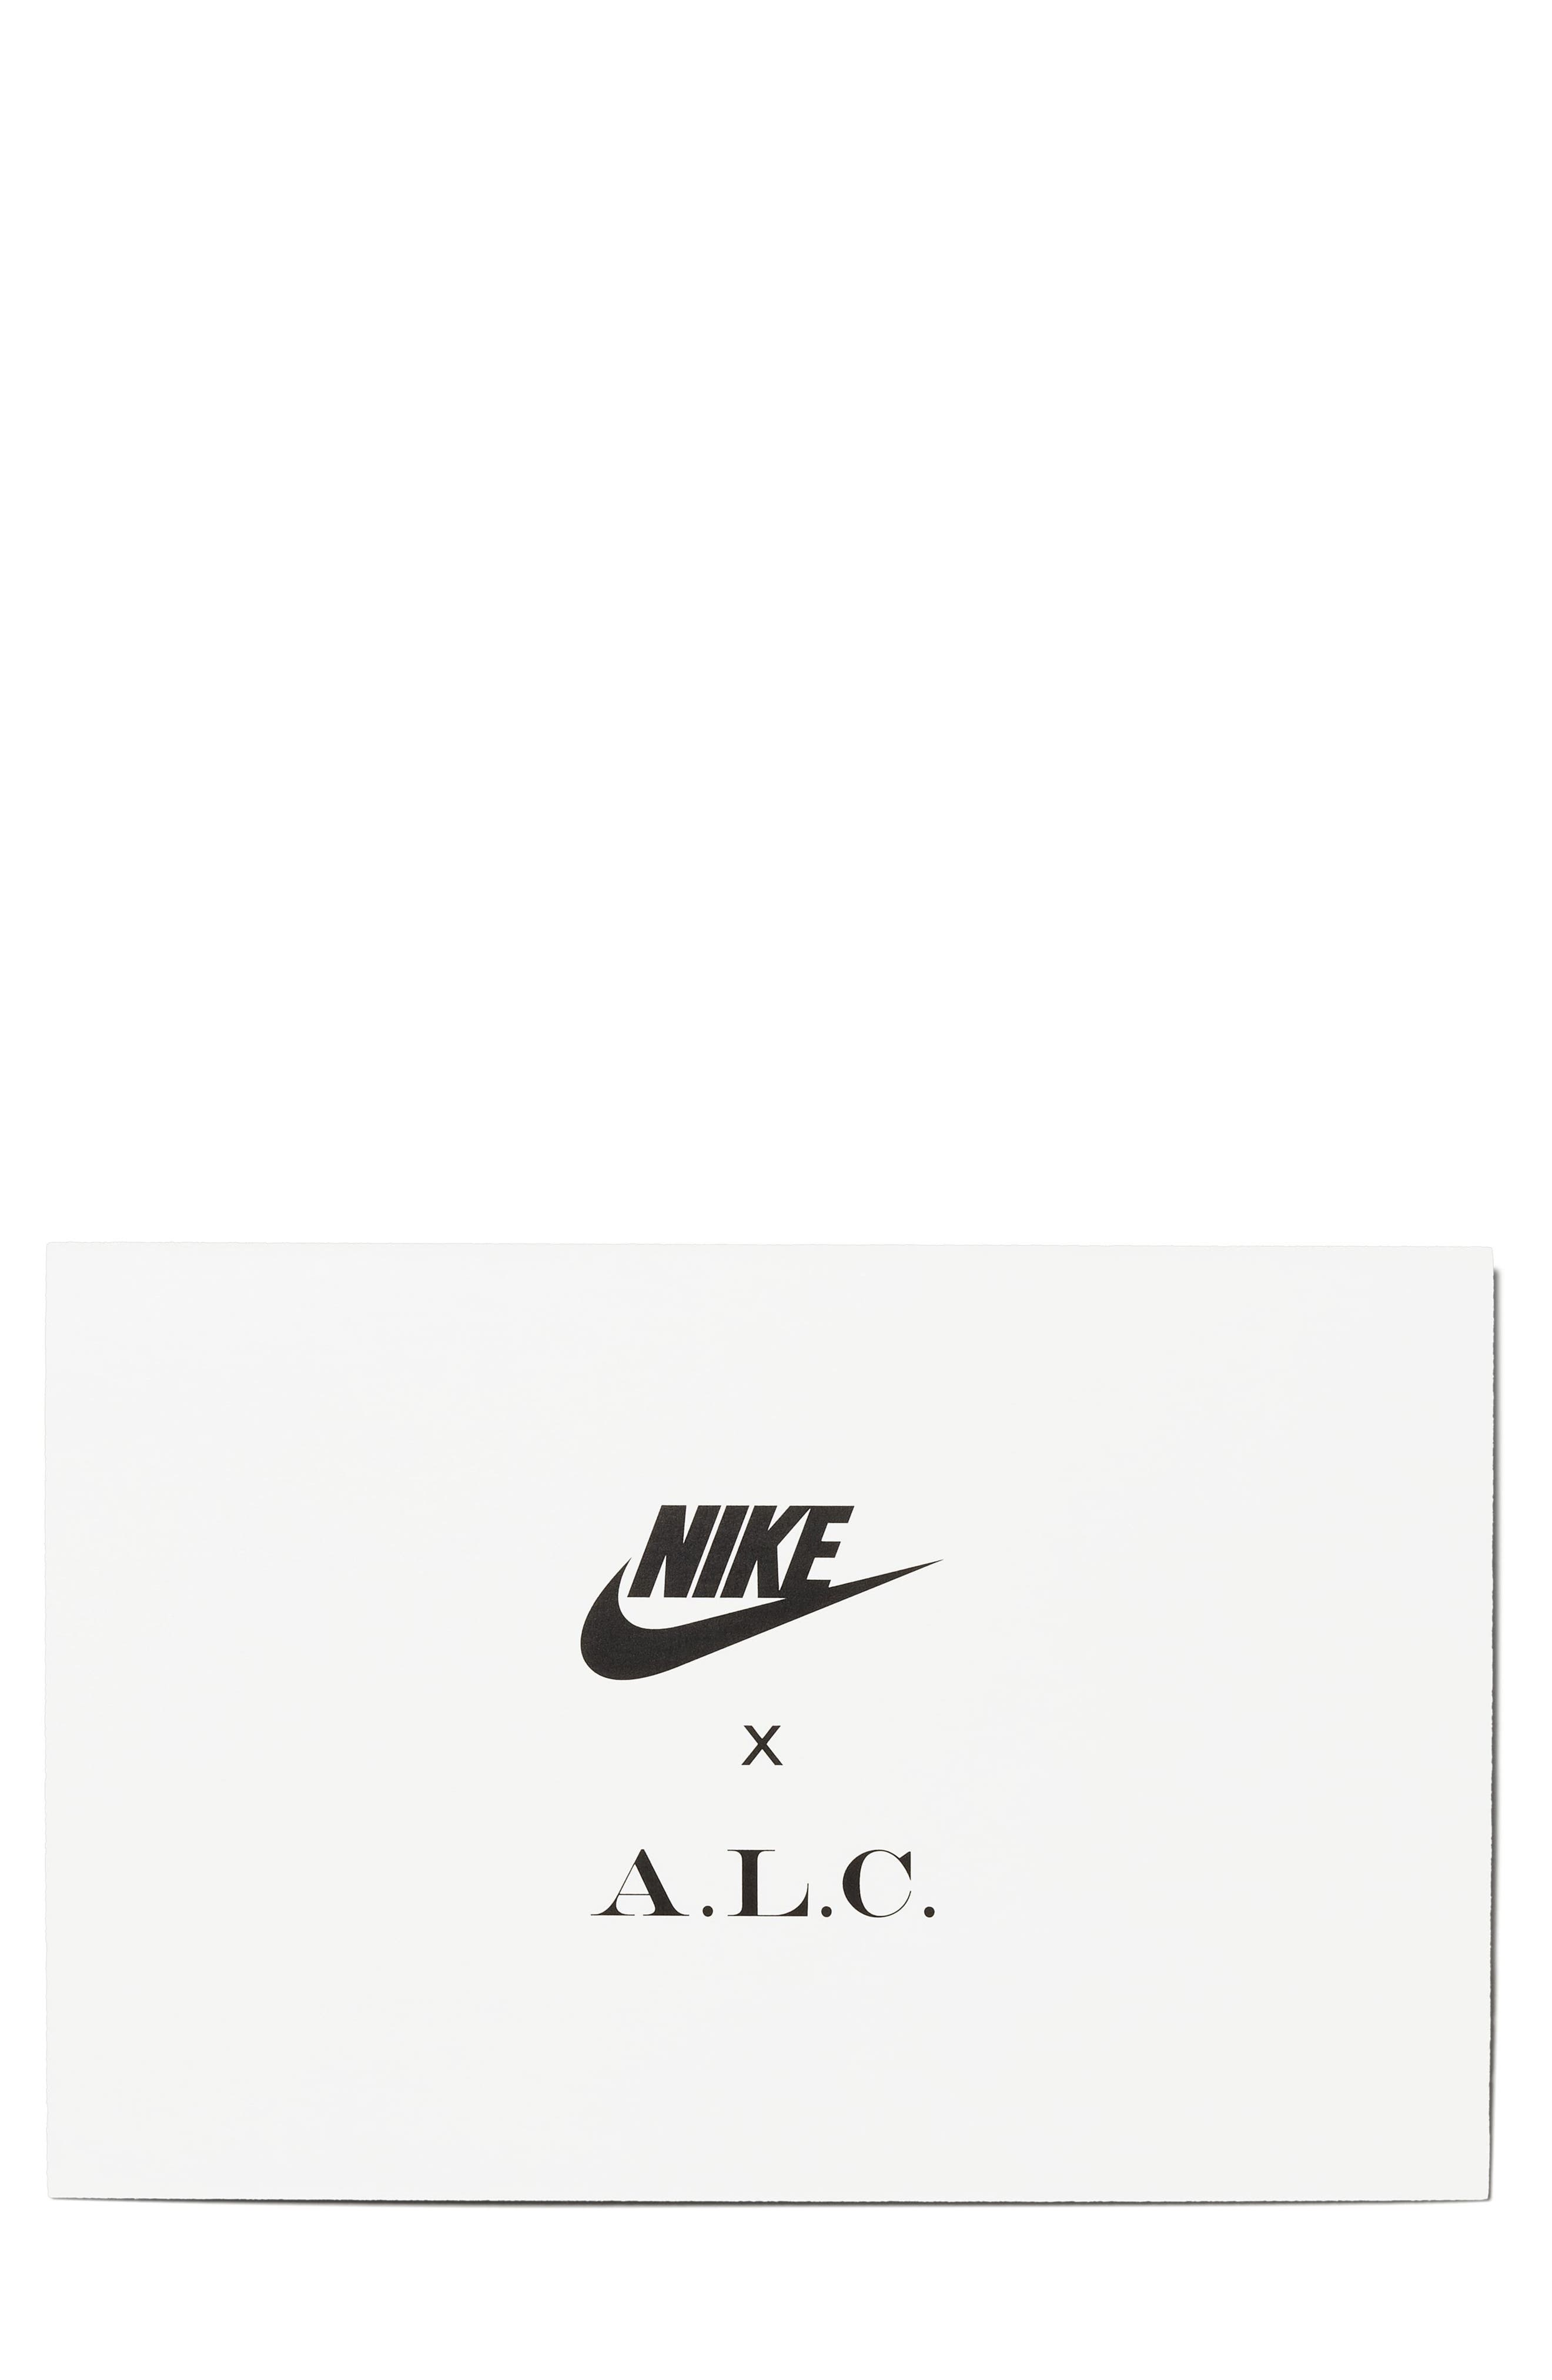 x A.L.C. Classic Cortez Sneaker,                             Alternate thumbnail 5, color,                             Midnight Spruce/ White